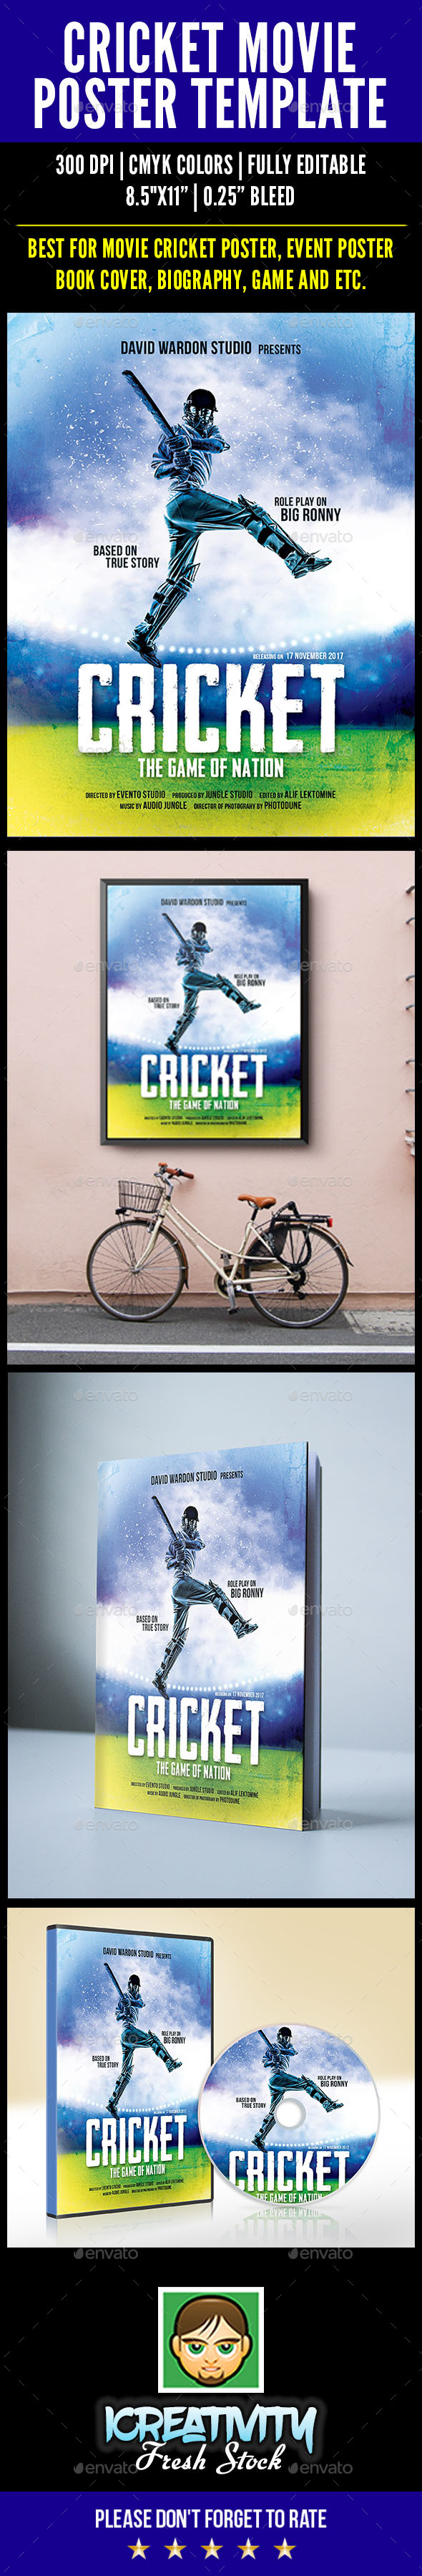 Cricket Movie Poster